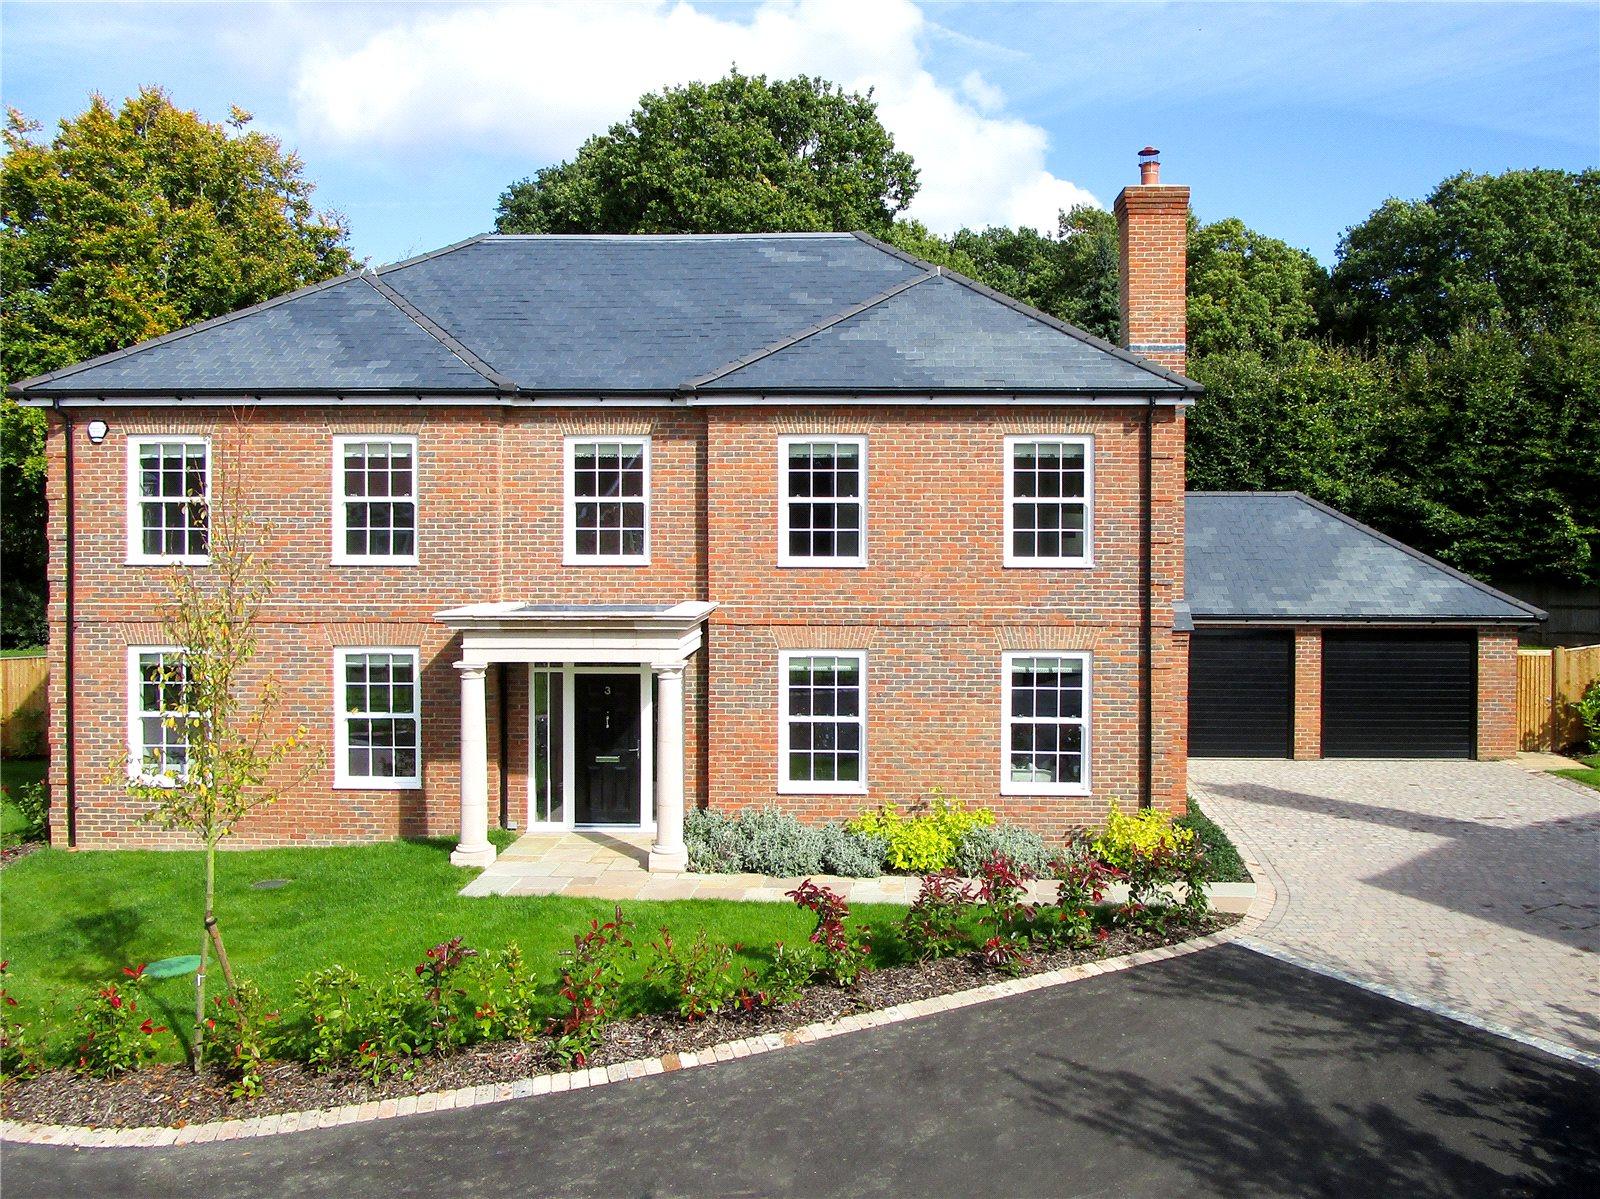 Частный дом для того Продажа на Paddock Gardens, Crouch, Borough Green, Sevenoaks, TN15 Sevenoaks, Англия